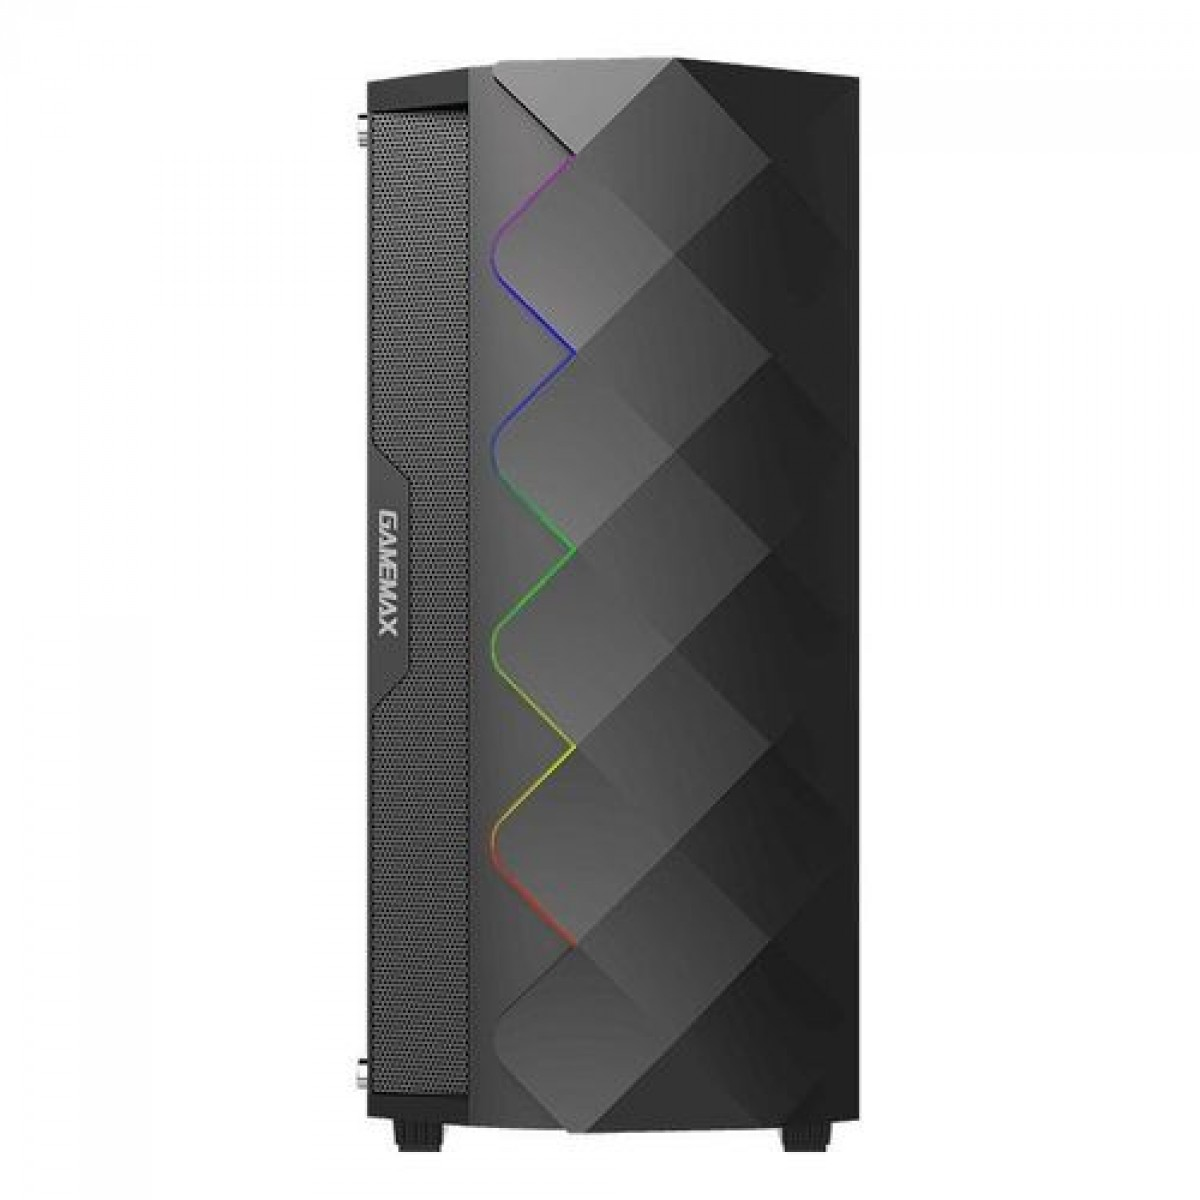 Gabinete Gamer Gamemax Diamond 3601, RGB,  Mid Tower, Com 1 Fan, Vidro Temperado, Black, S-Fonte